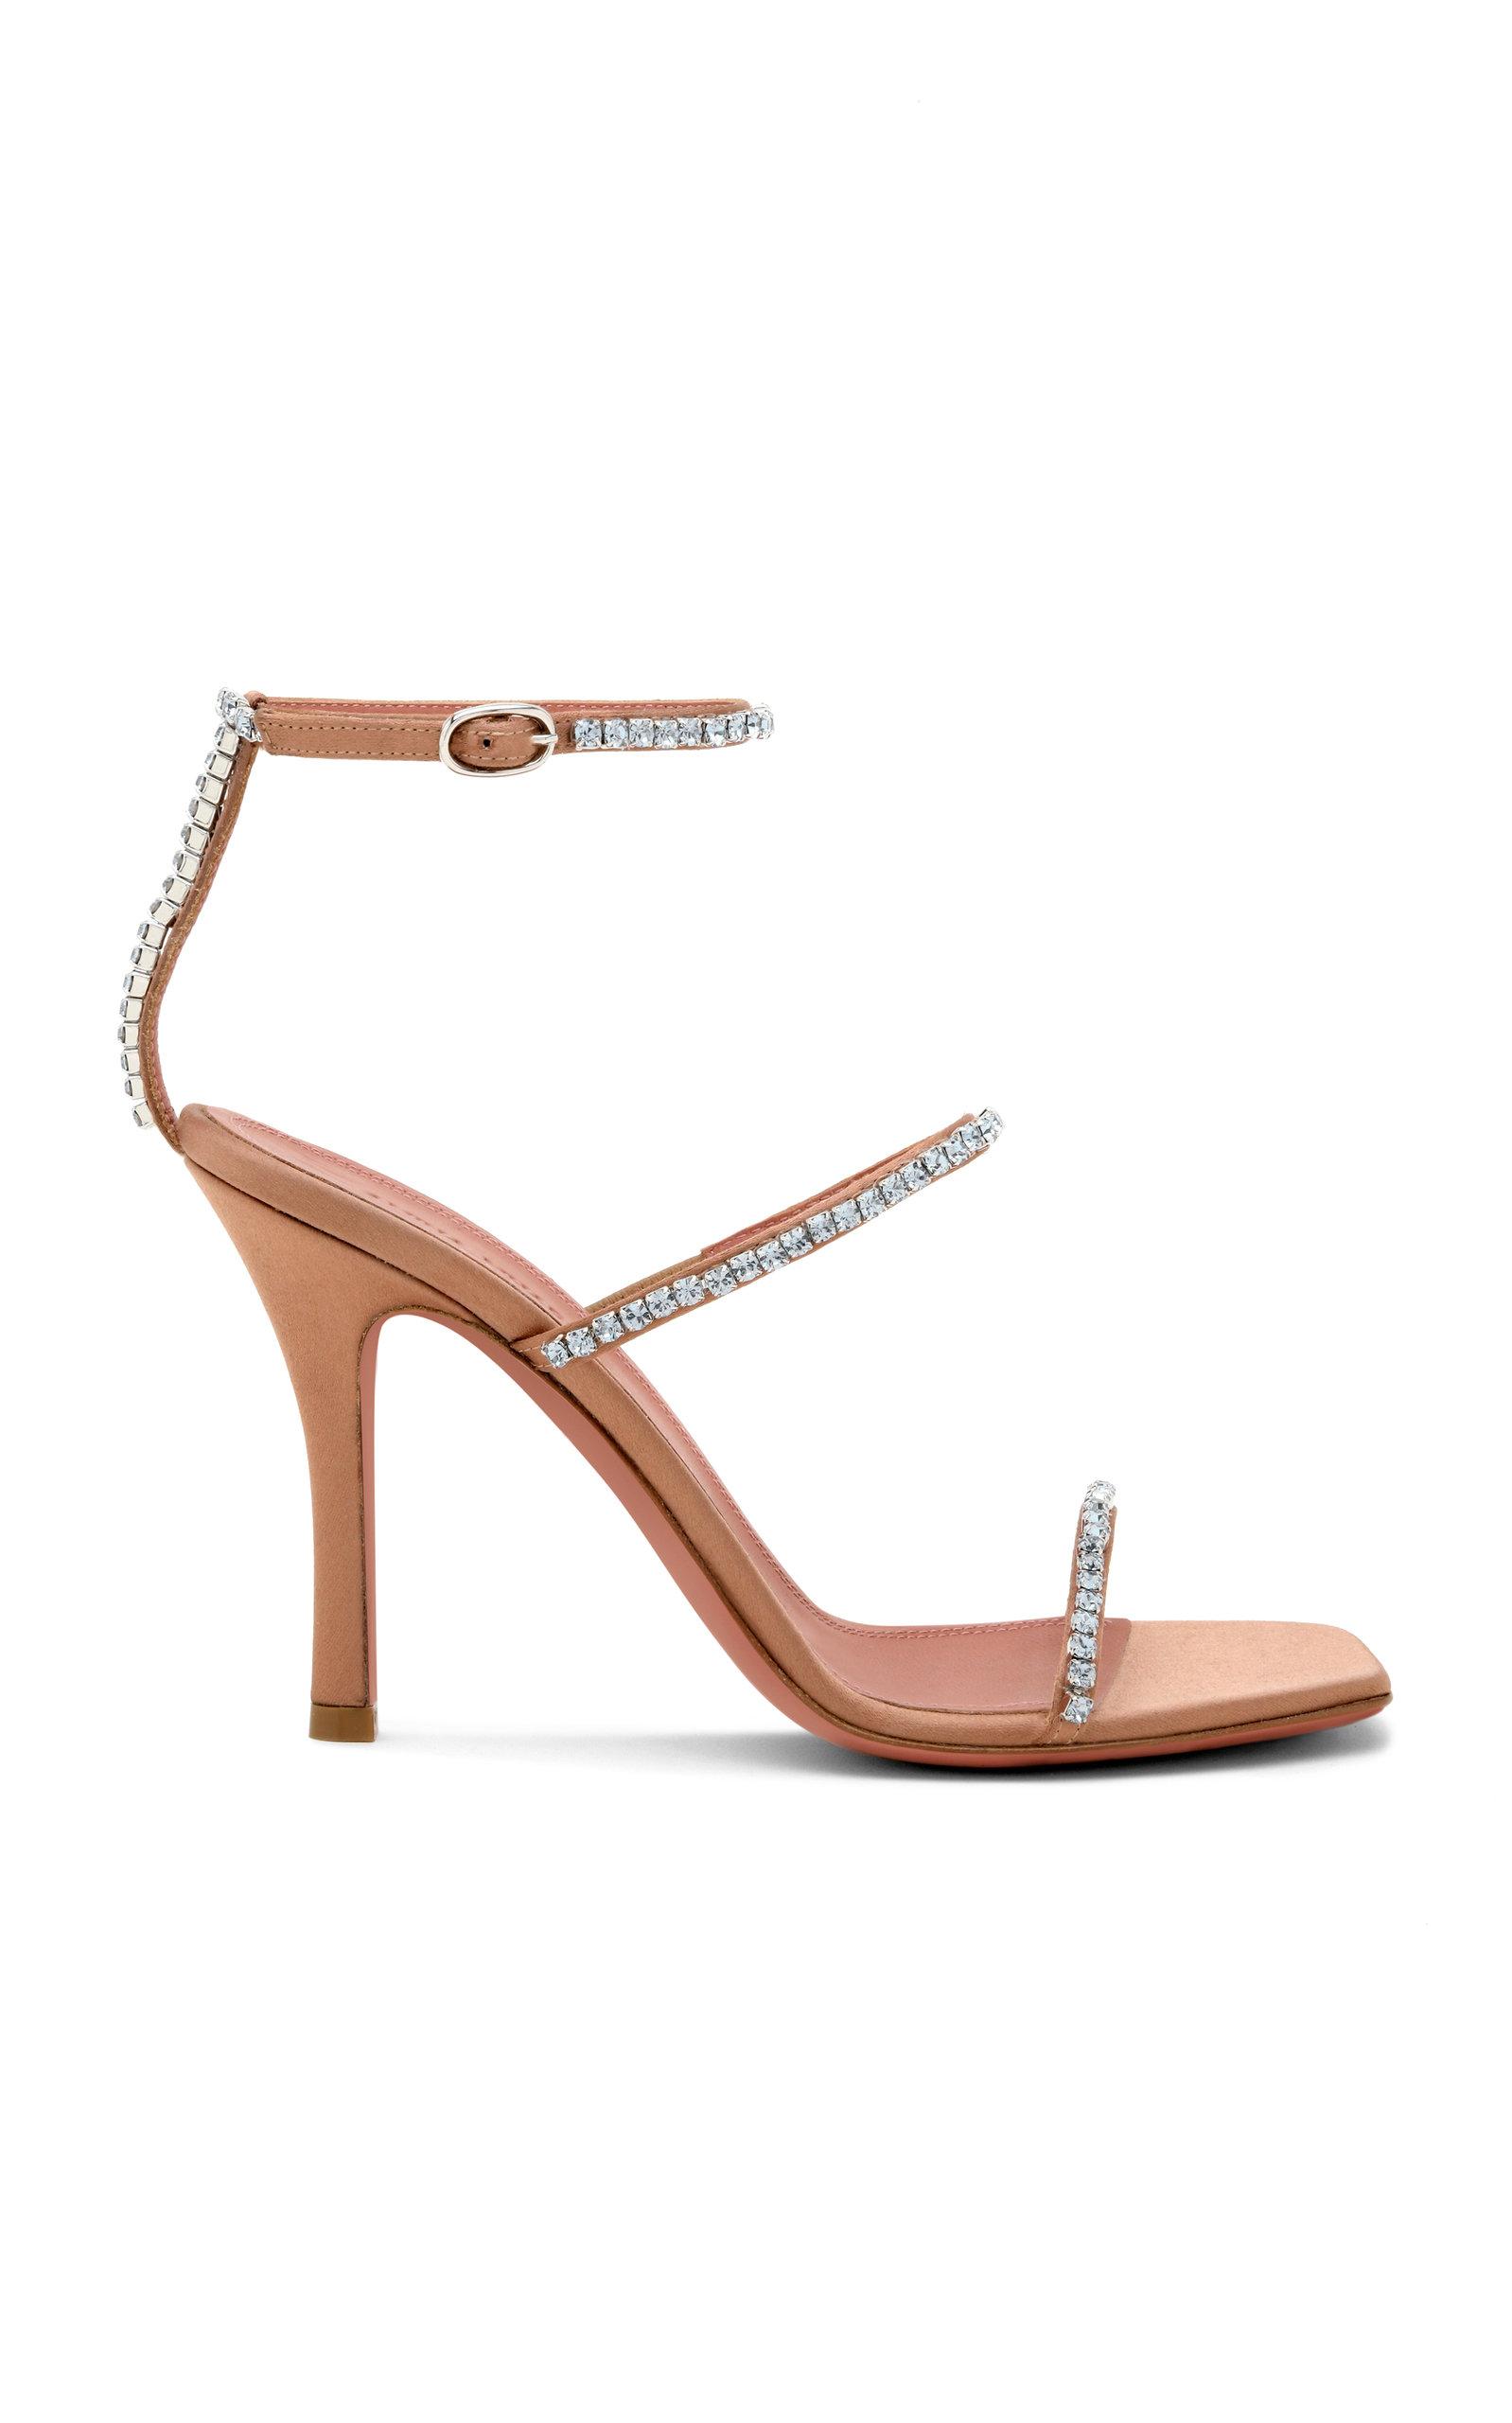 Amina Muaddi – Women's Gilda Crystal-Embellished Satin Sandals – Neutral – Moda Operandi